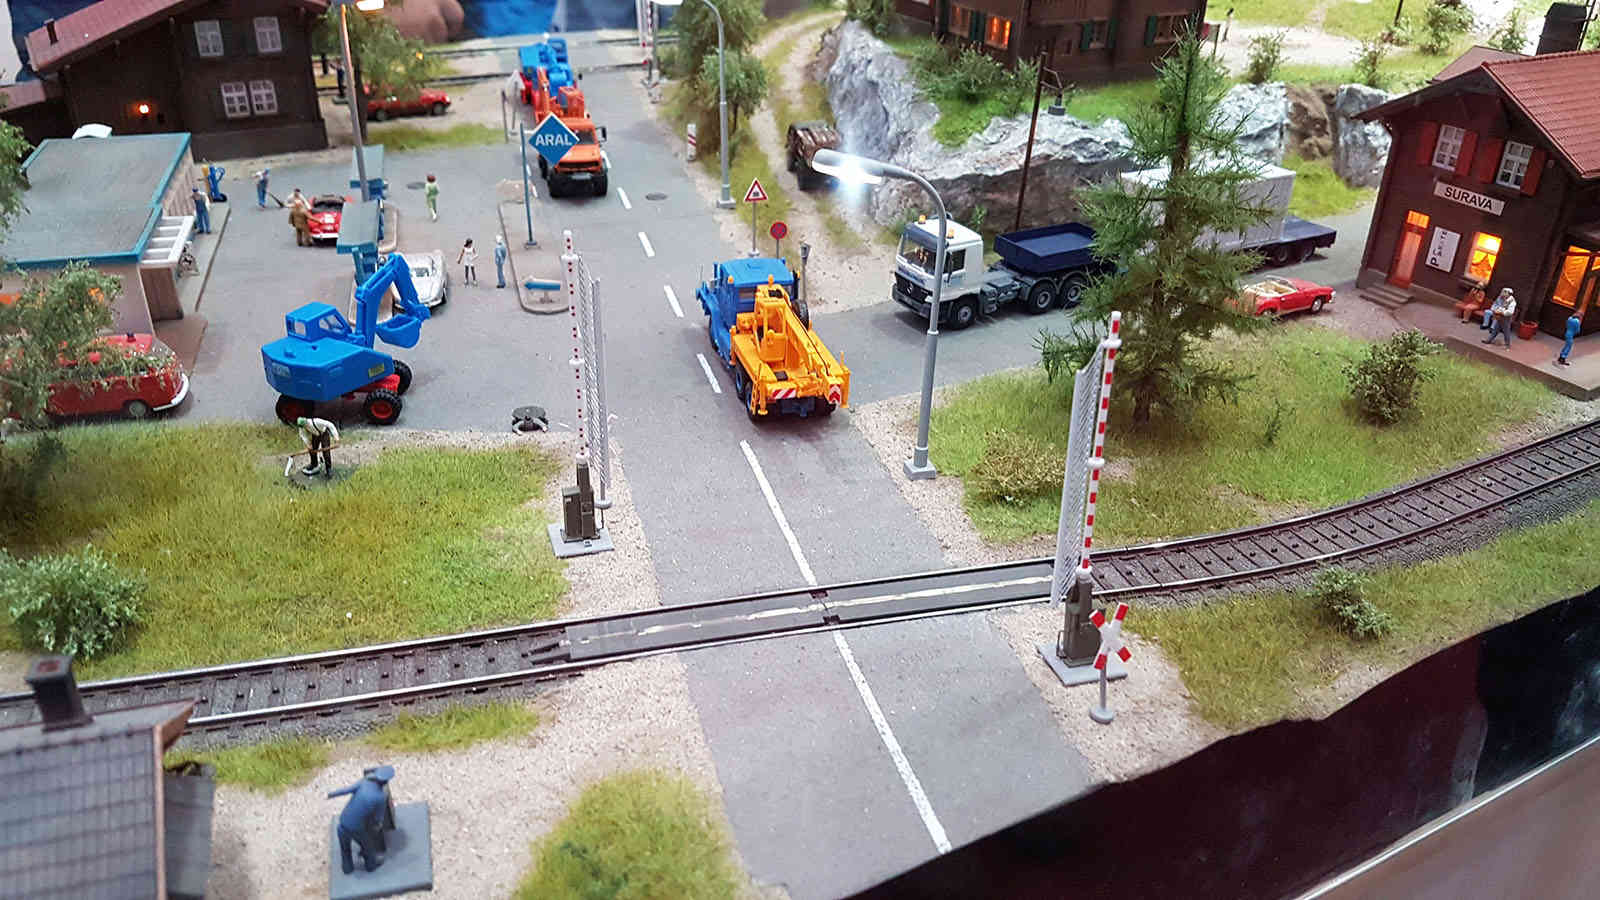 M Bel Sinsheim de faszination modellbahn sinsheim du 10 au 12 mars